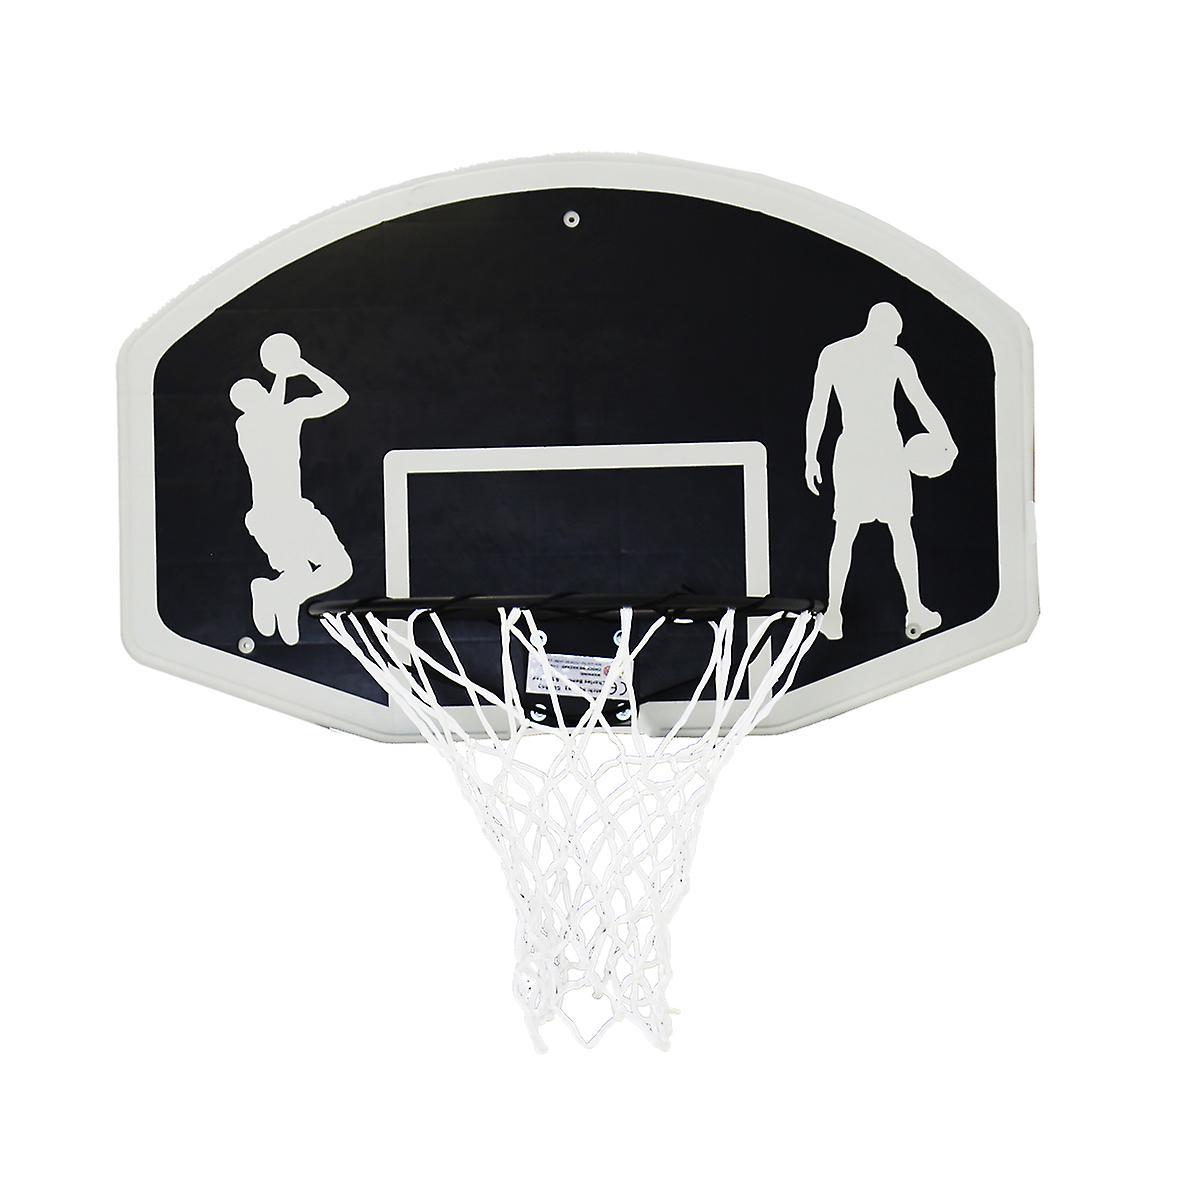 Charles Bentley Kids Anello Basket Rete E Palla Set Taglia 7 Ufficiale Basket